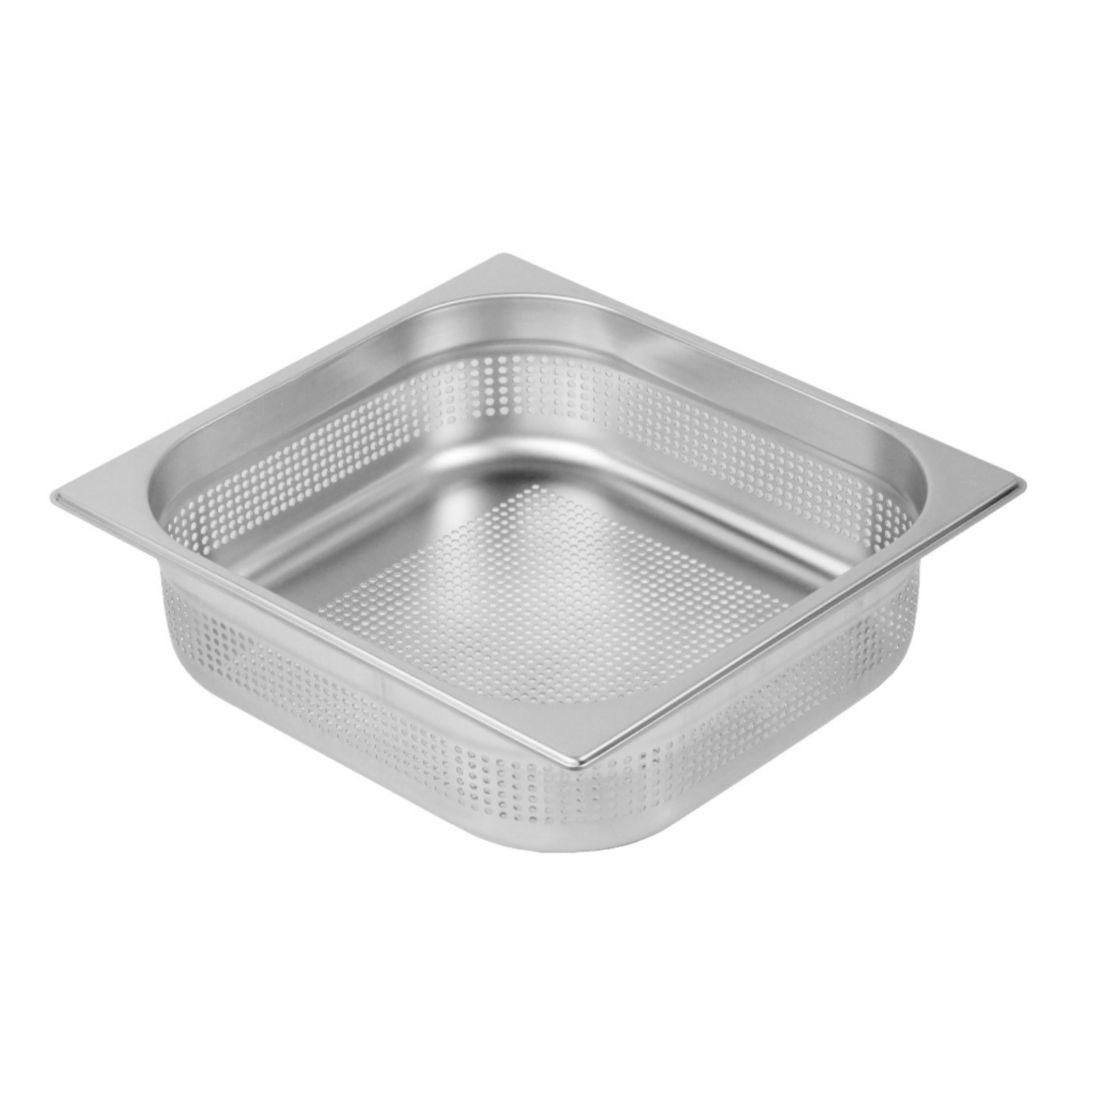 Gastronádoba perforovaná GN 2/3 040 mm